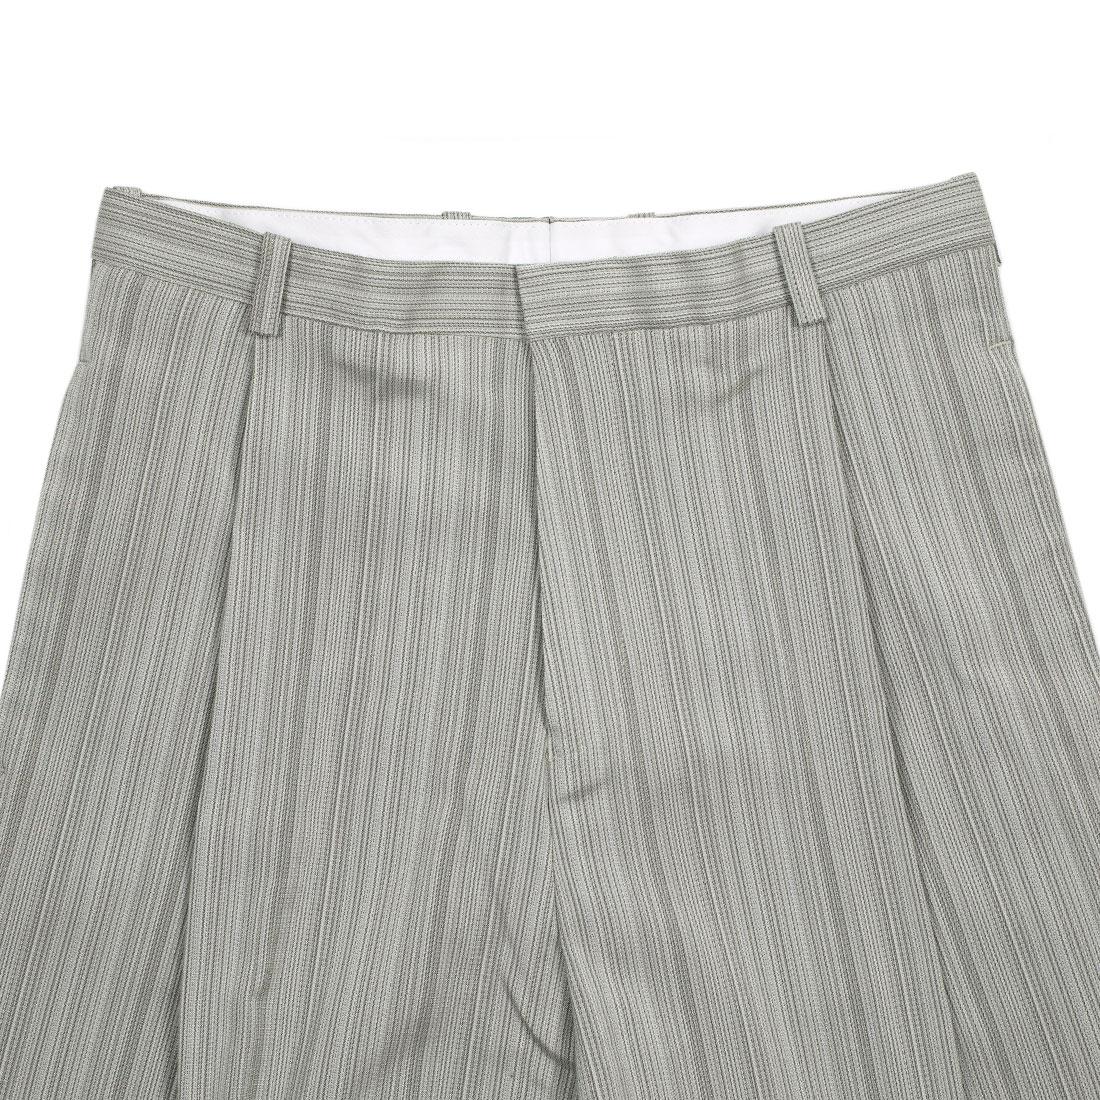 Stephan Schneider Spring Summer 2021 SS21 striped viscose pleated trousers (4).jpg